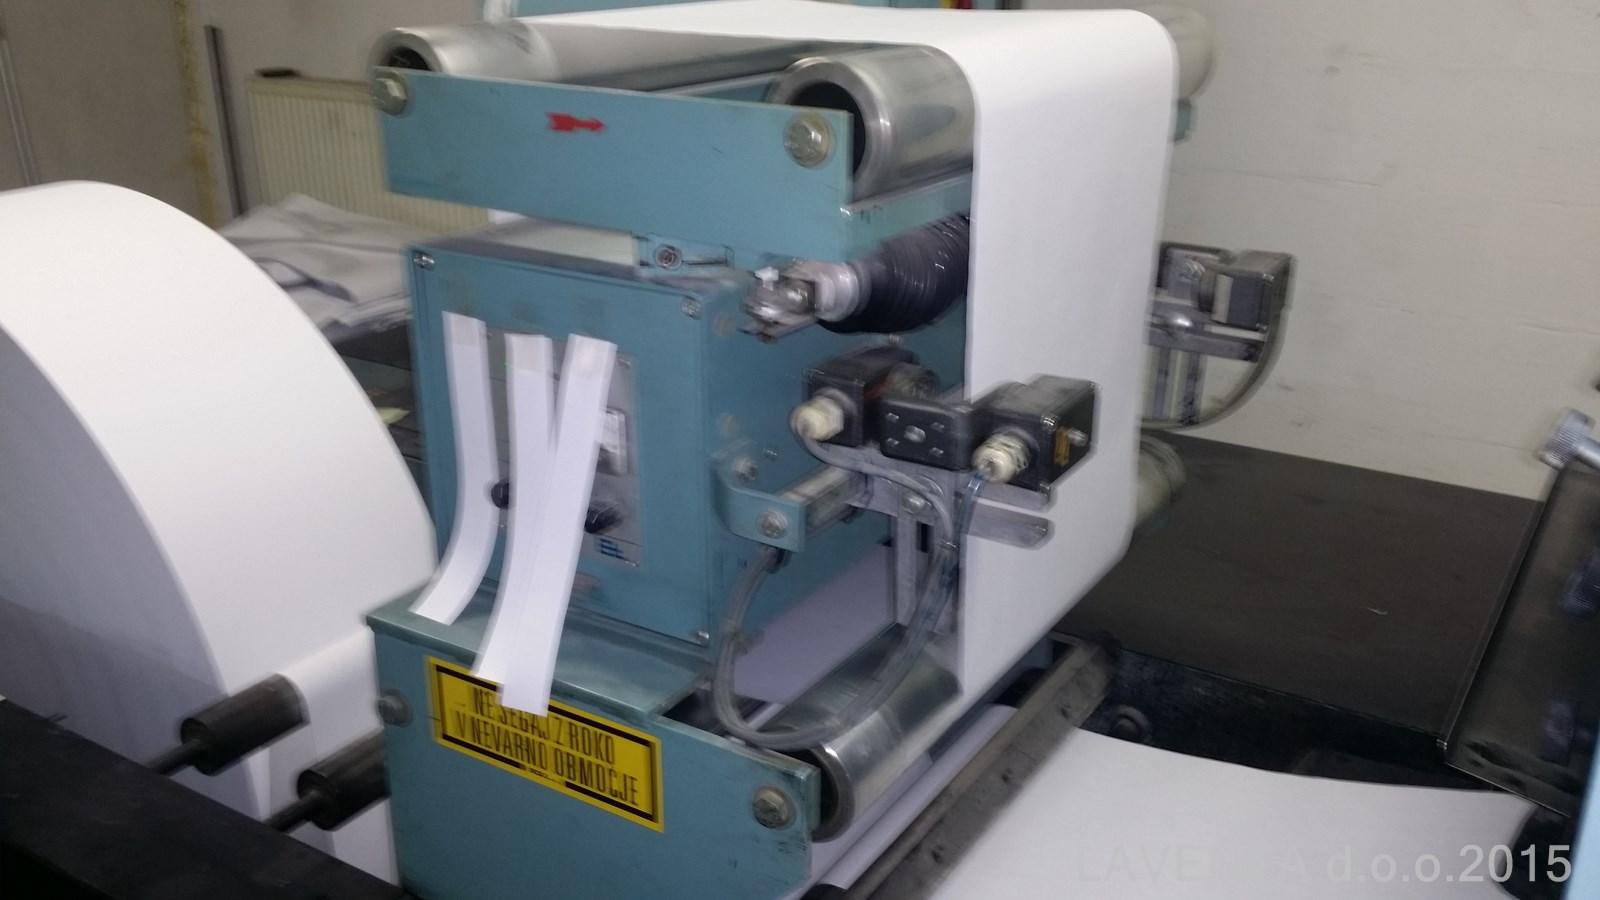 "EDELMANN Form print 17"" Web continuous printing press - Exapro"